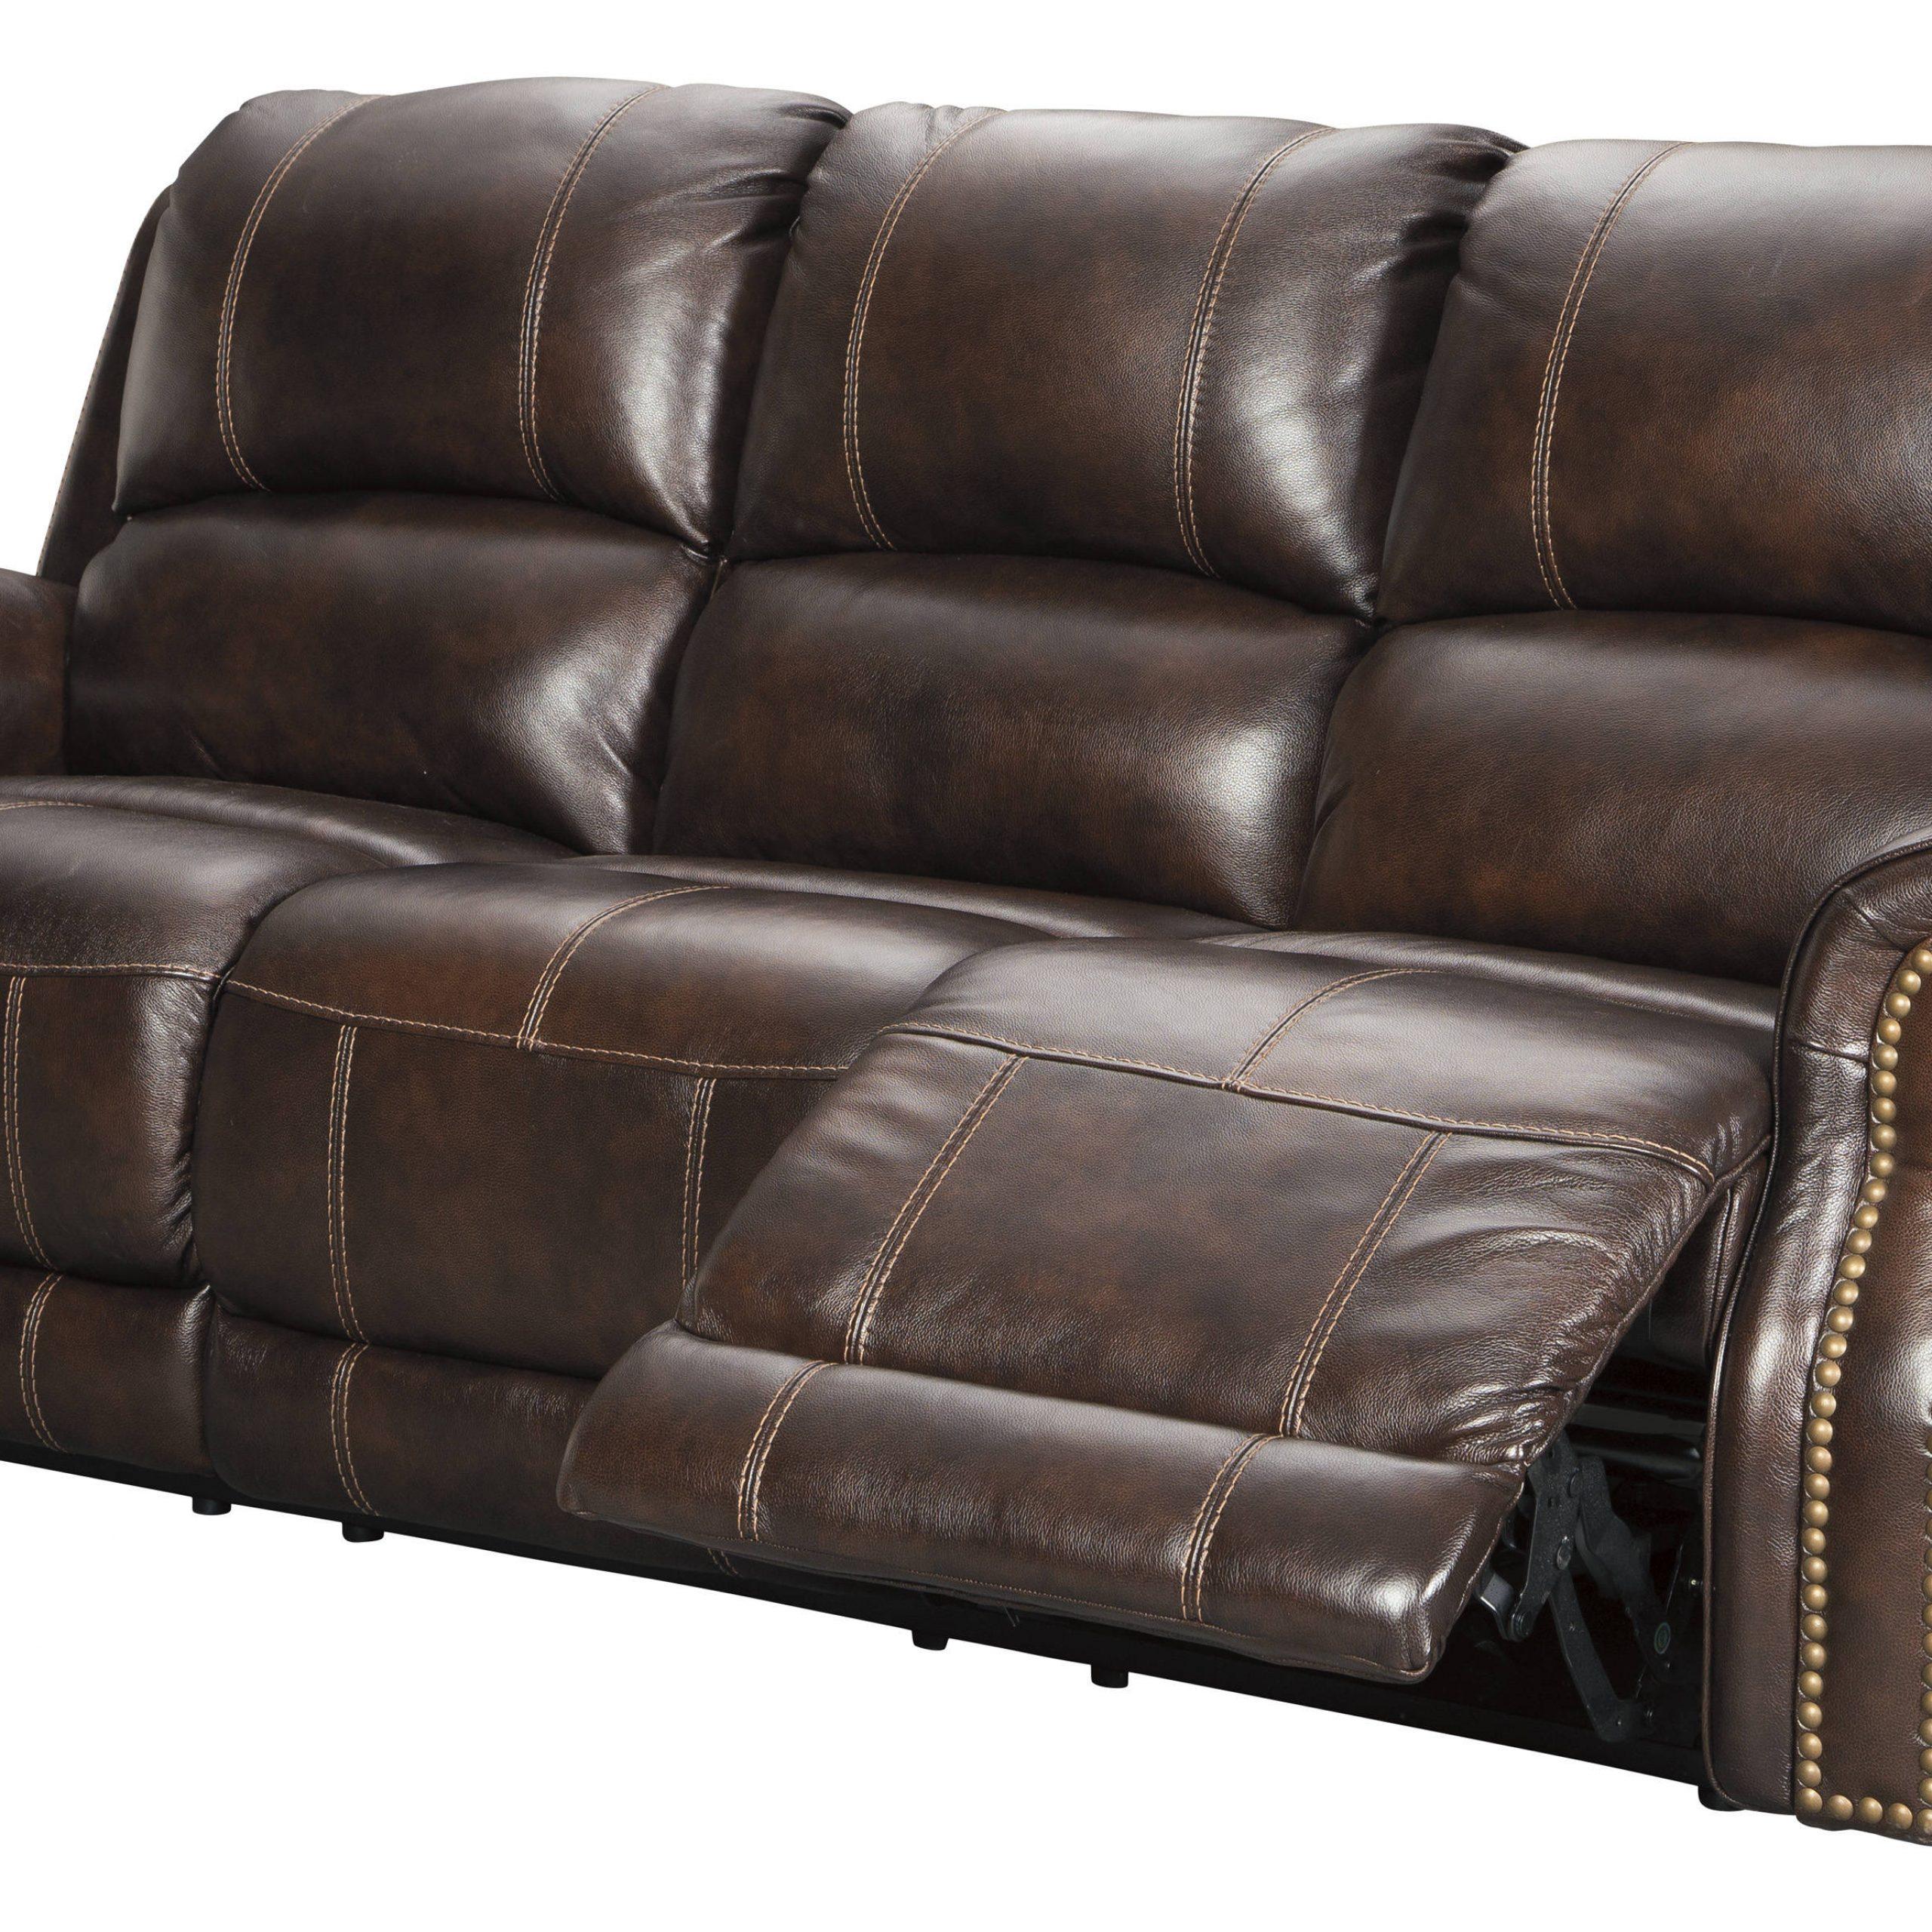 2018 Raven Power Reclining Sofas Regarding Ashley Furniture Buncrana Power Reclining Sofa With (View 15 of 15)